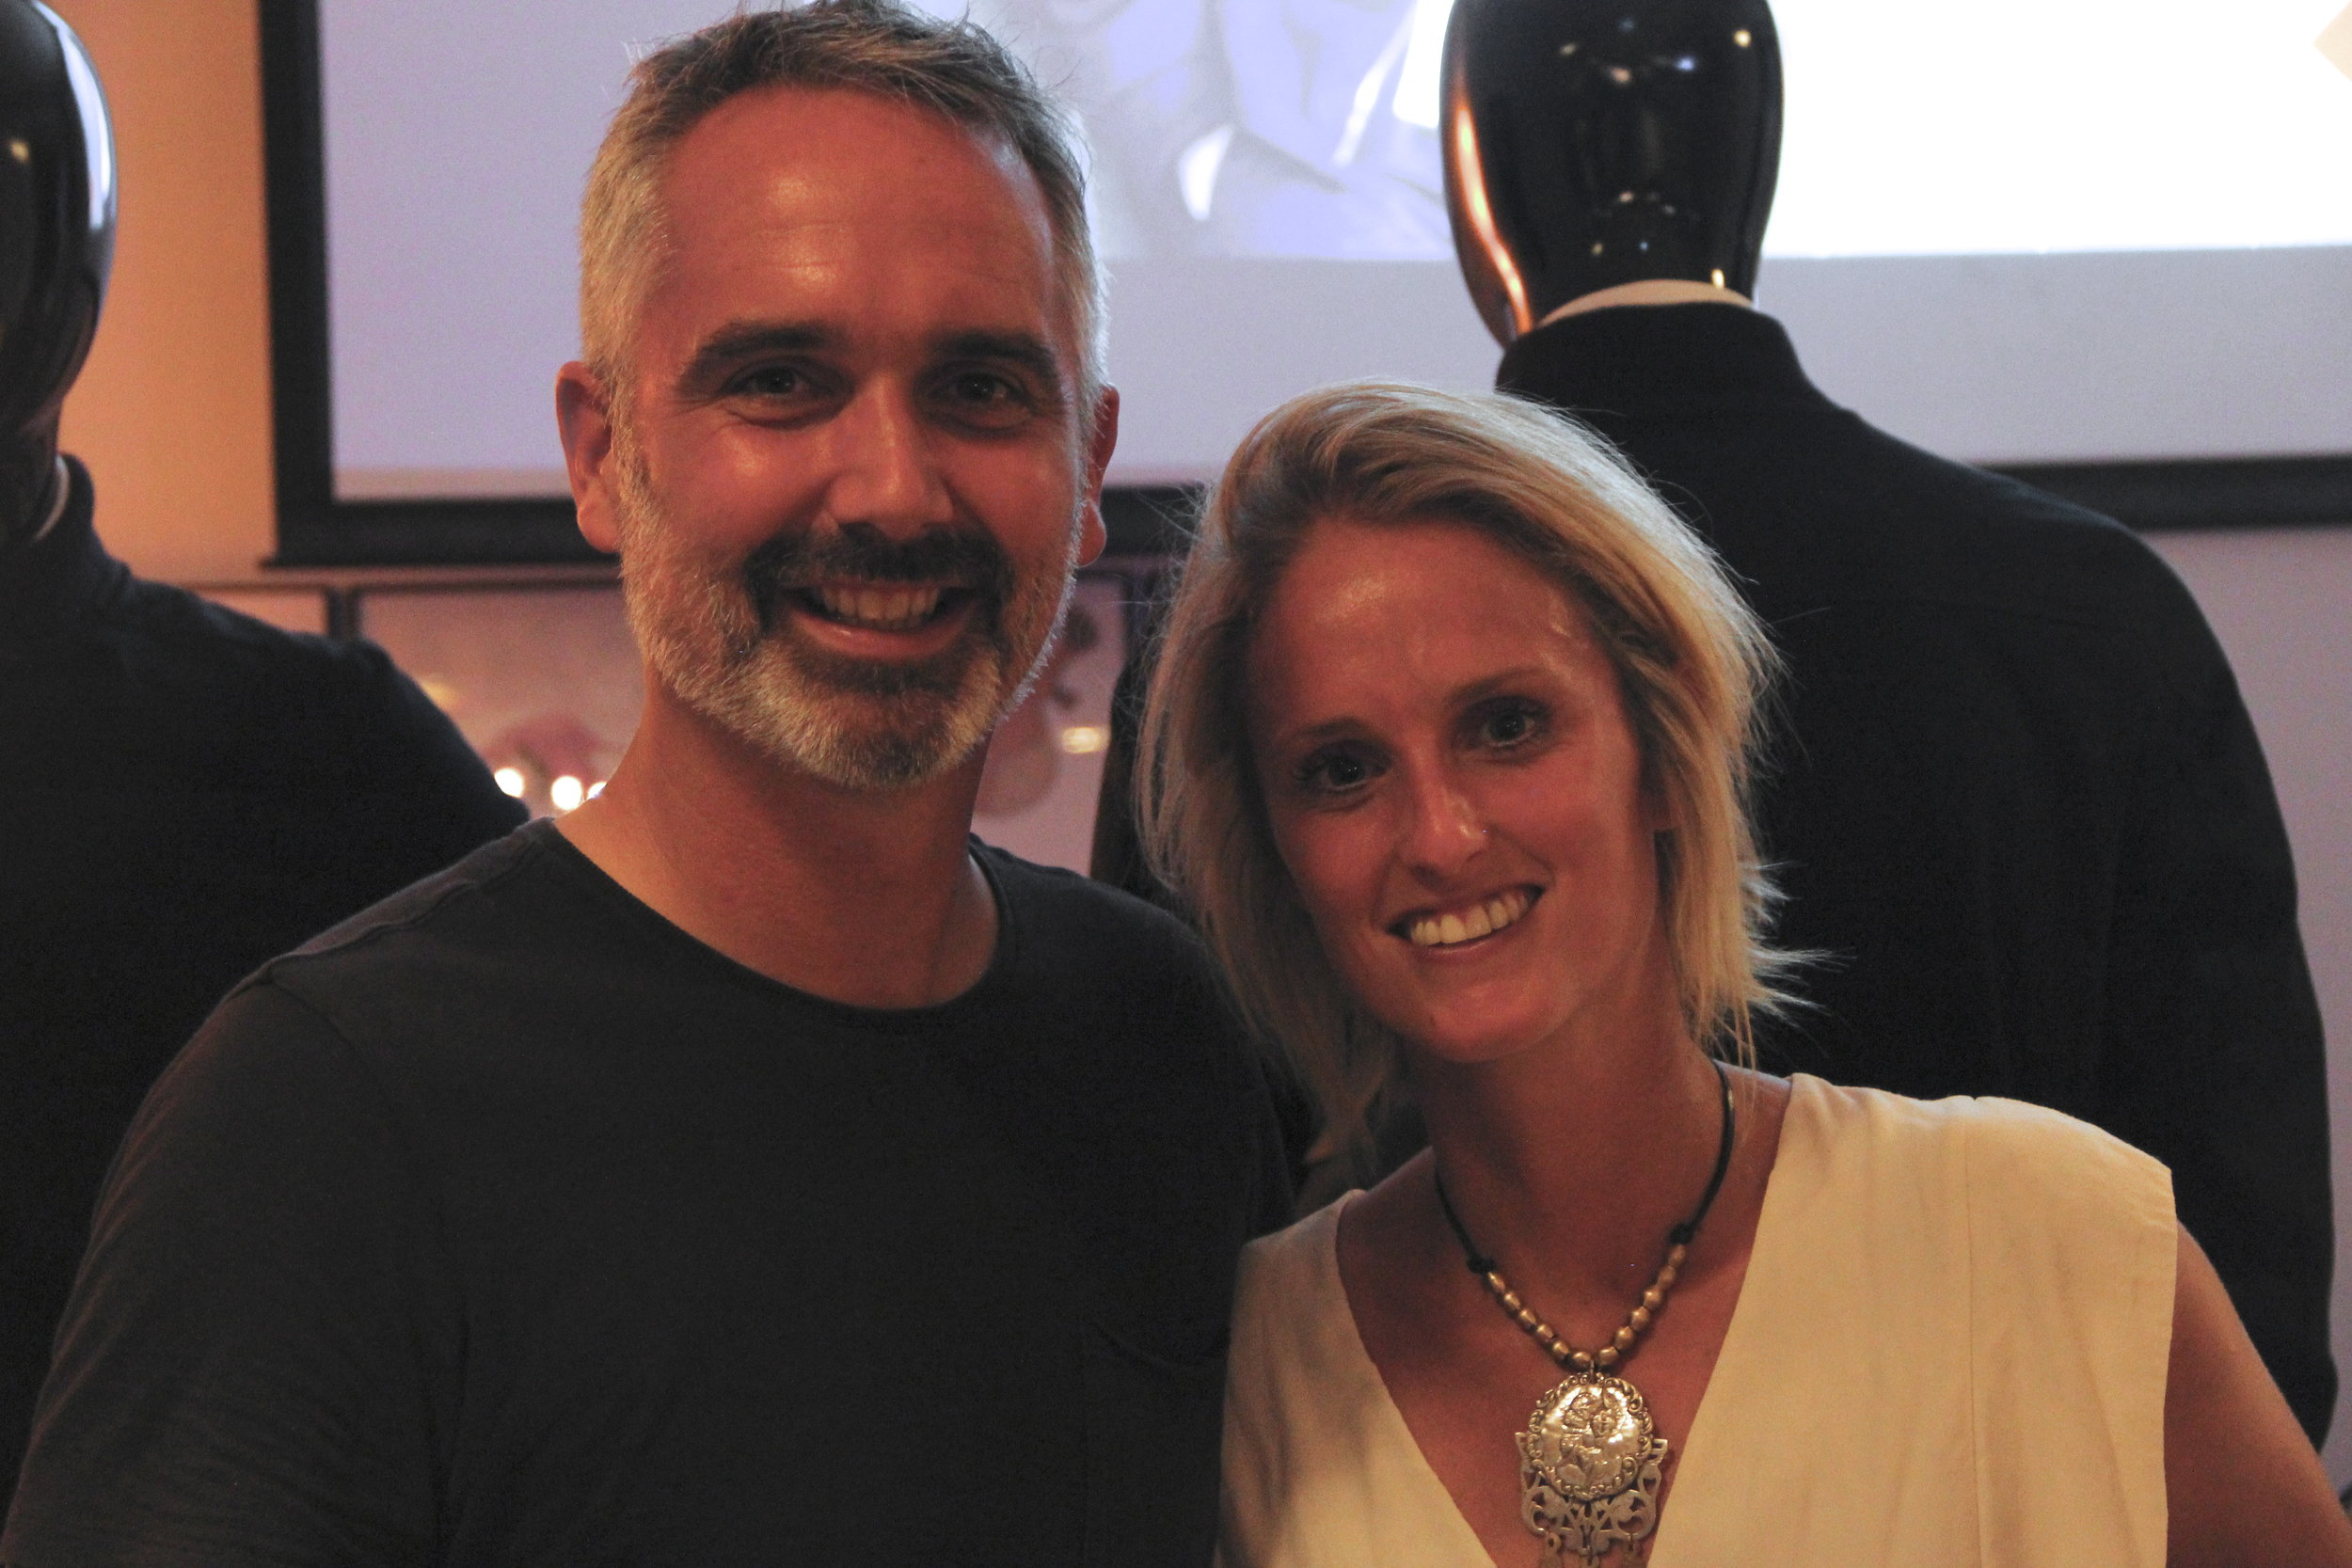 Doug and Lucy, LUMO's founders